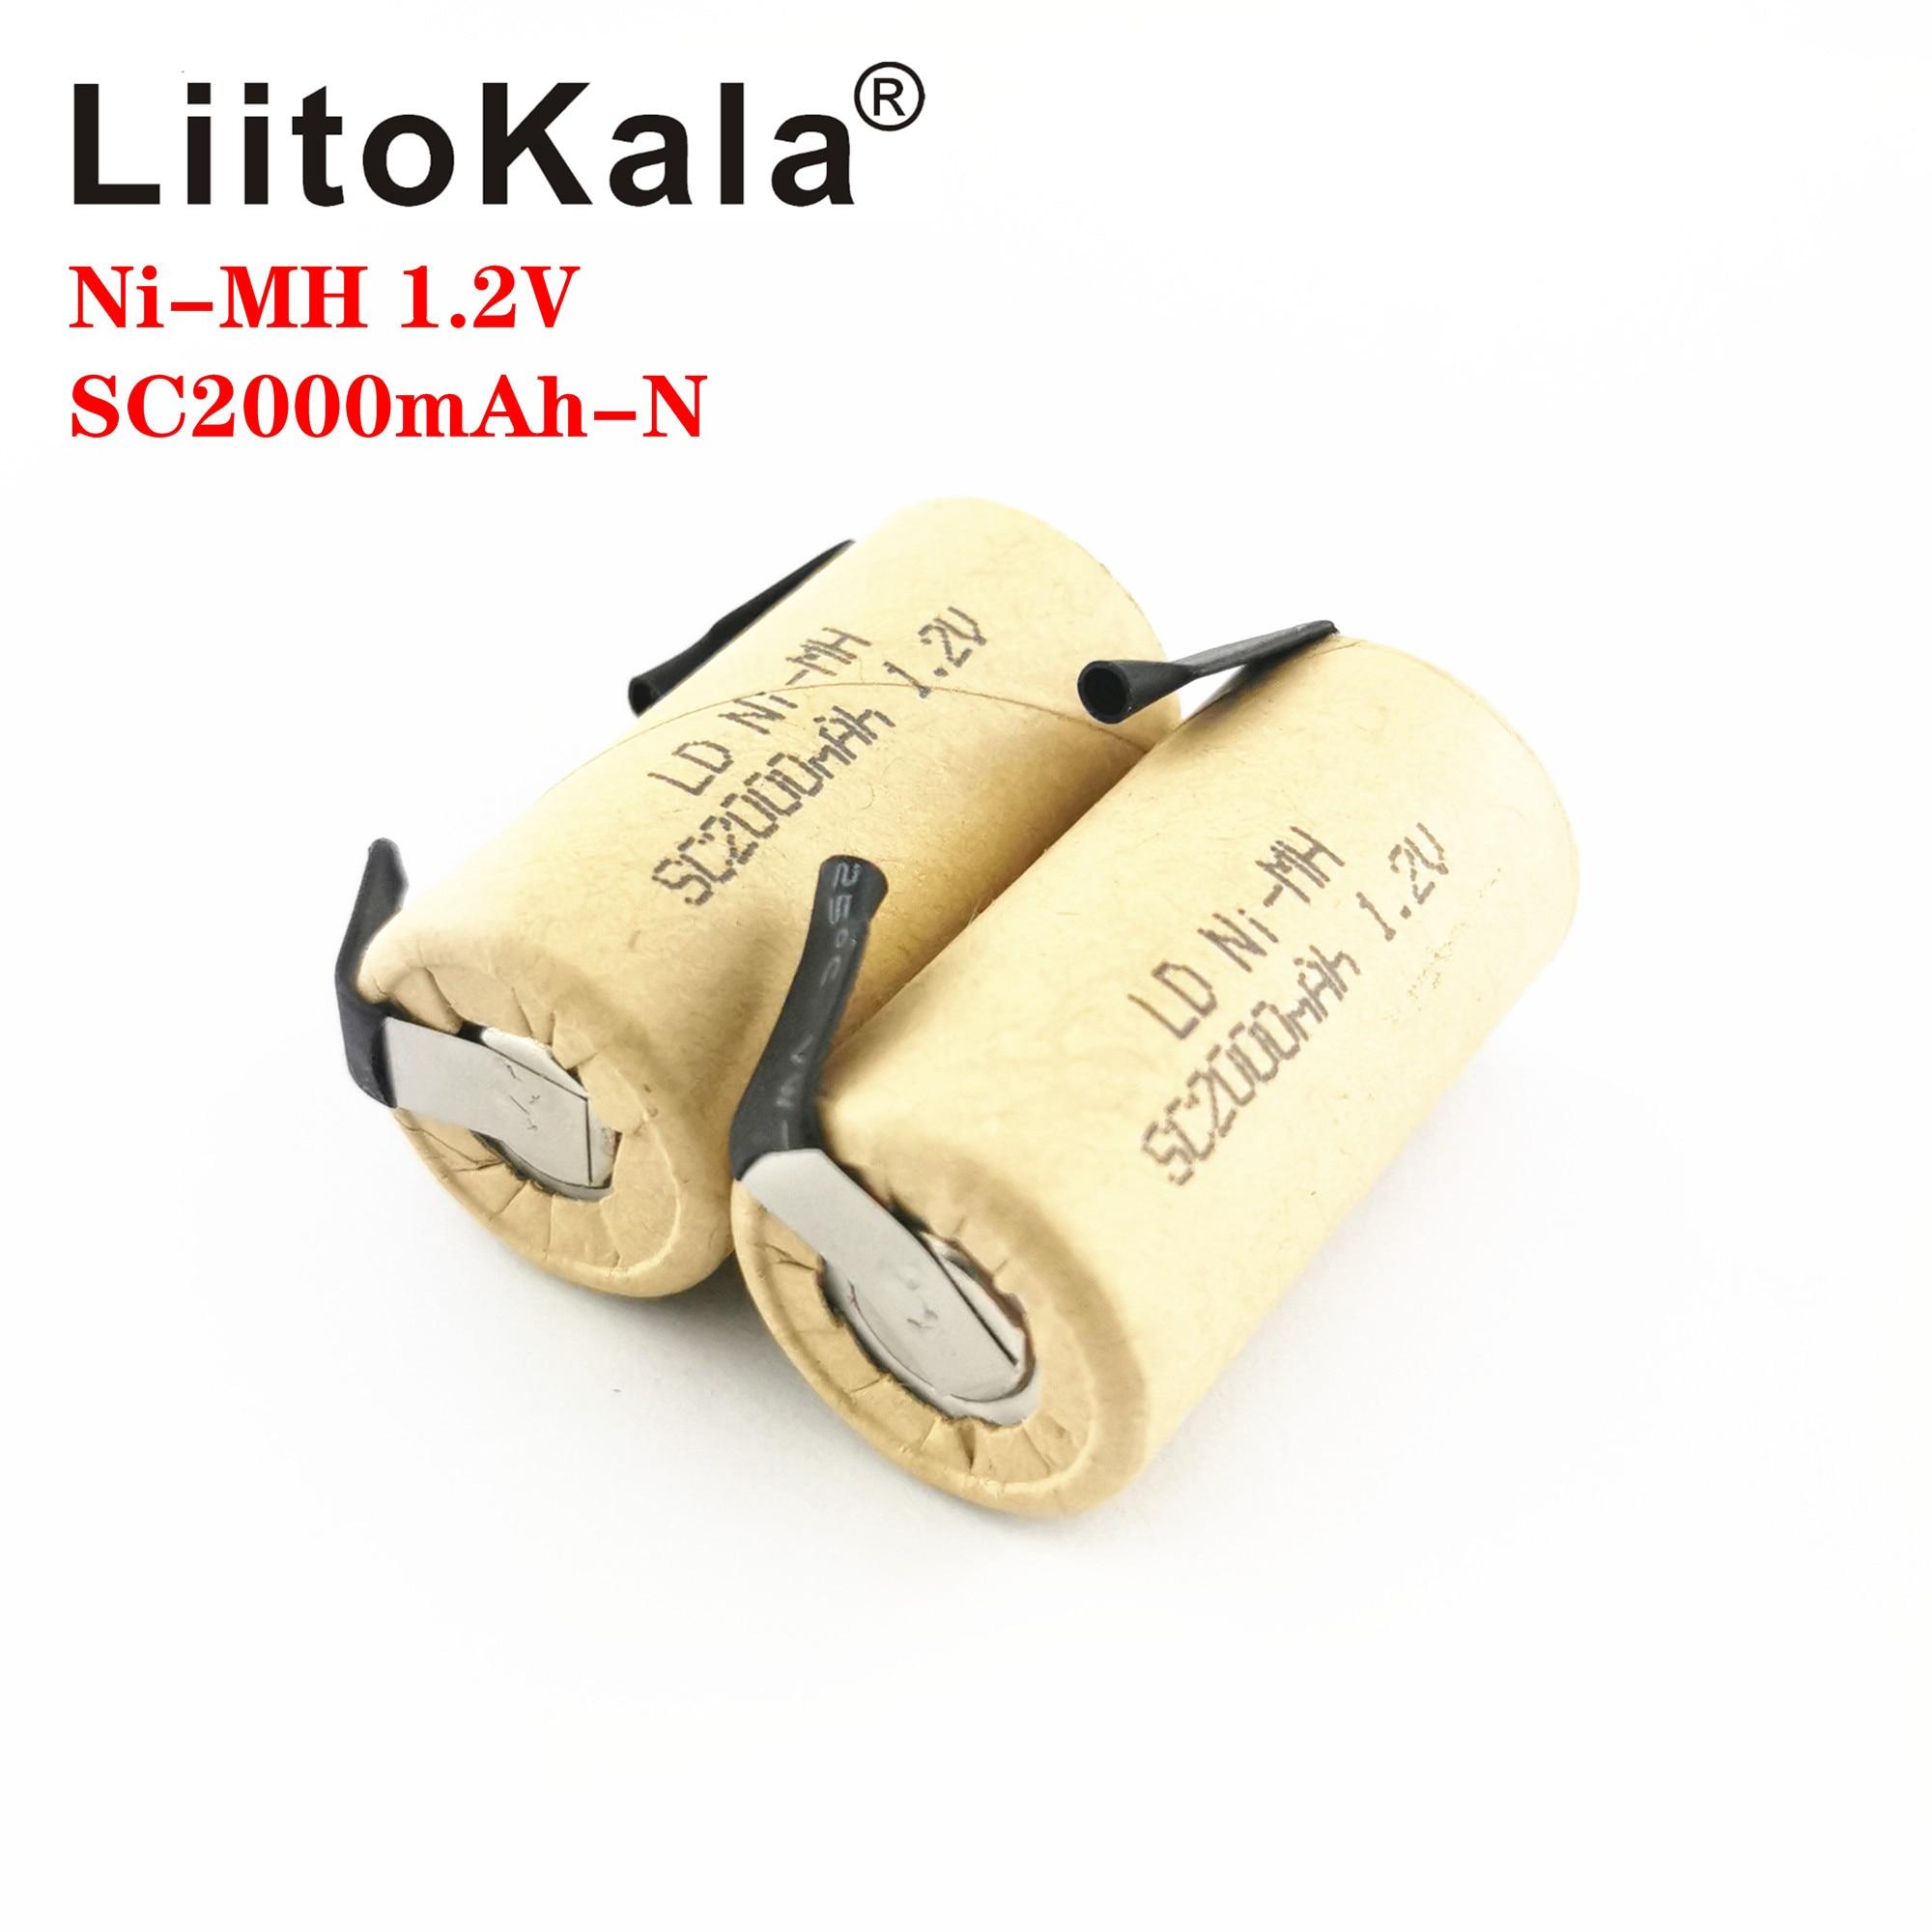 LiitoKala Ni-MH 1,2 V SC 2000mAh Ni MH, herramienta de alta potencia, batería, tasa de descarga de celda, baterías recargables 10C, celdas nicke DIY